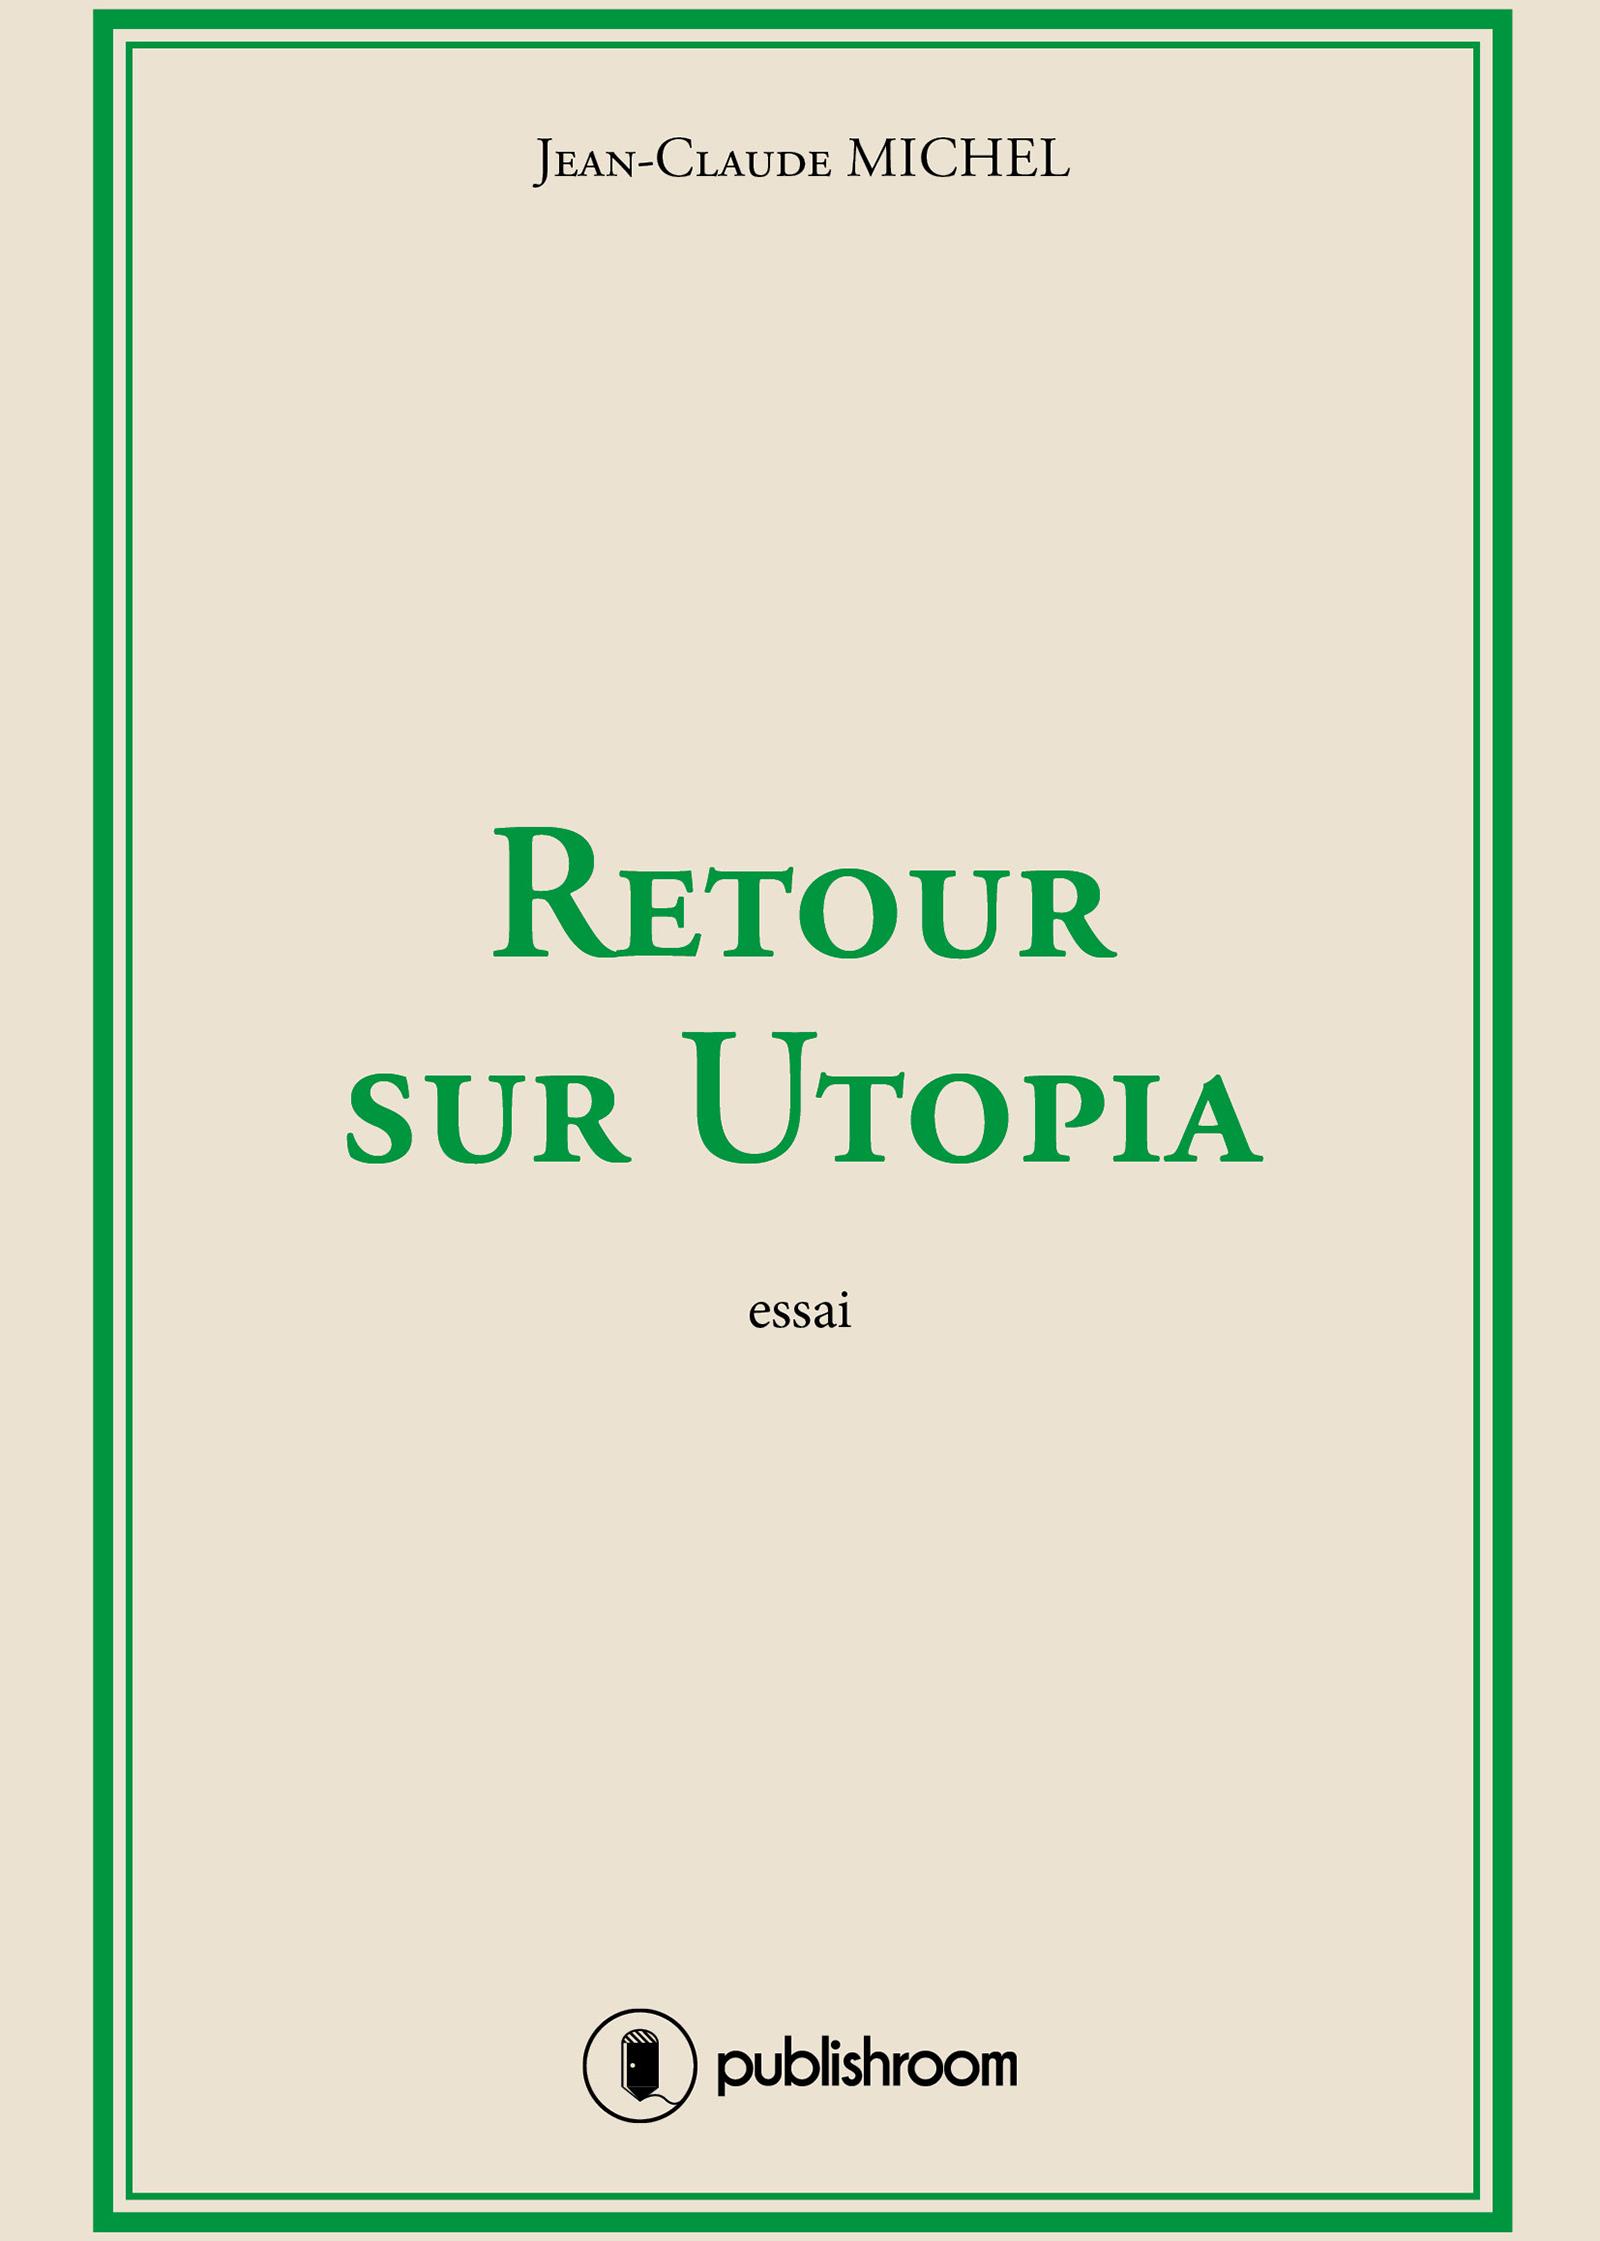 RETOUR SUR UTOPIA